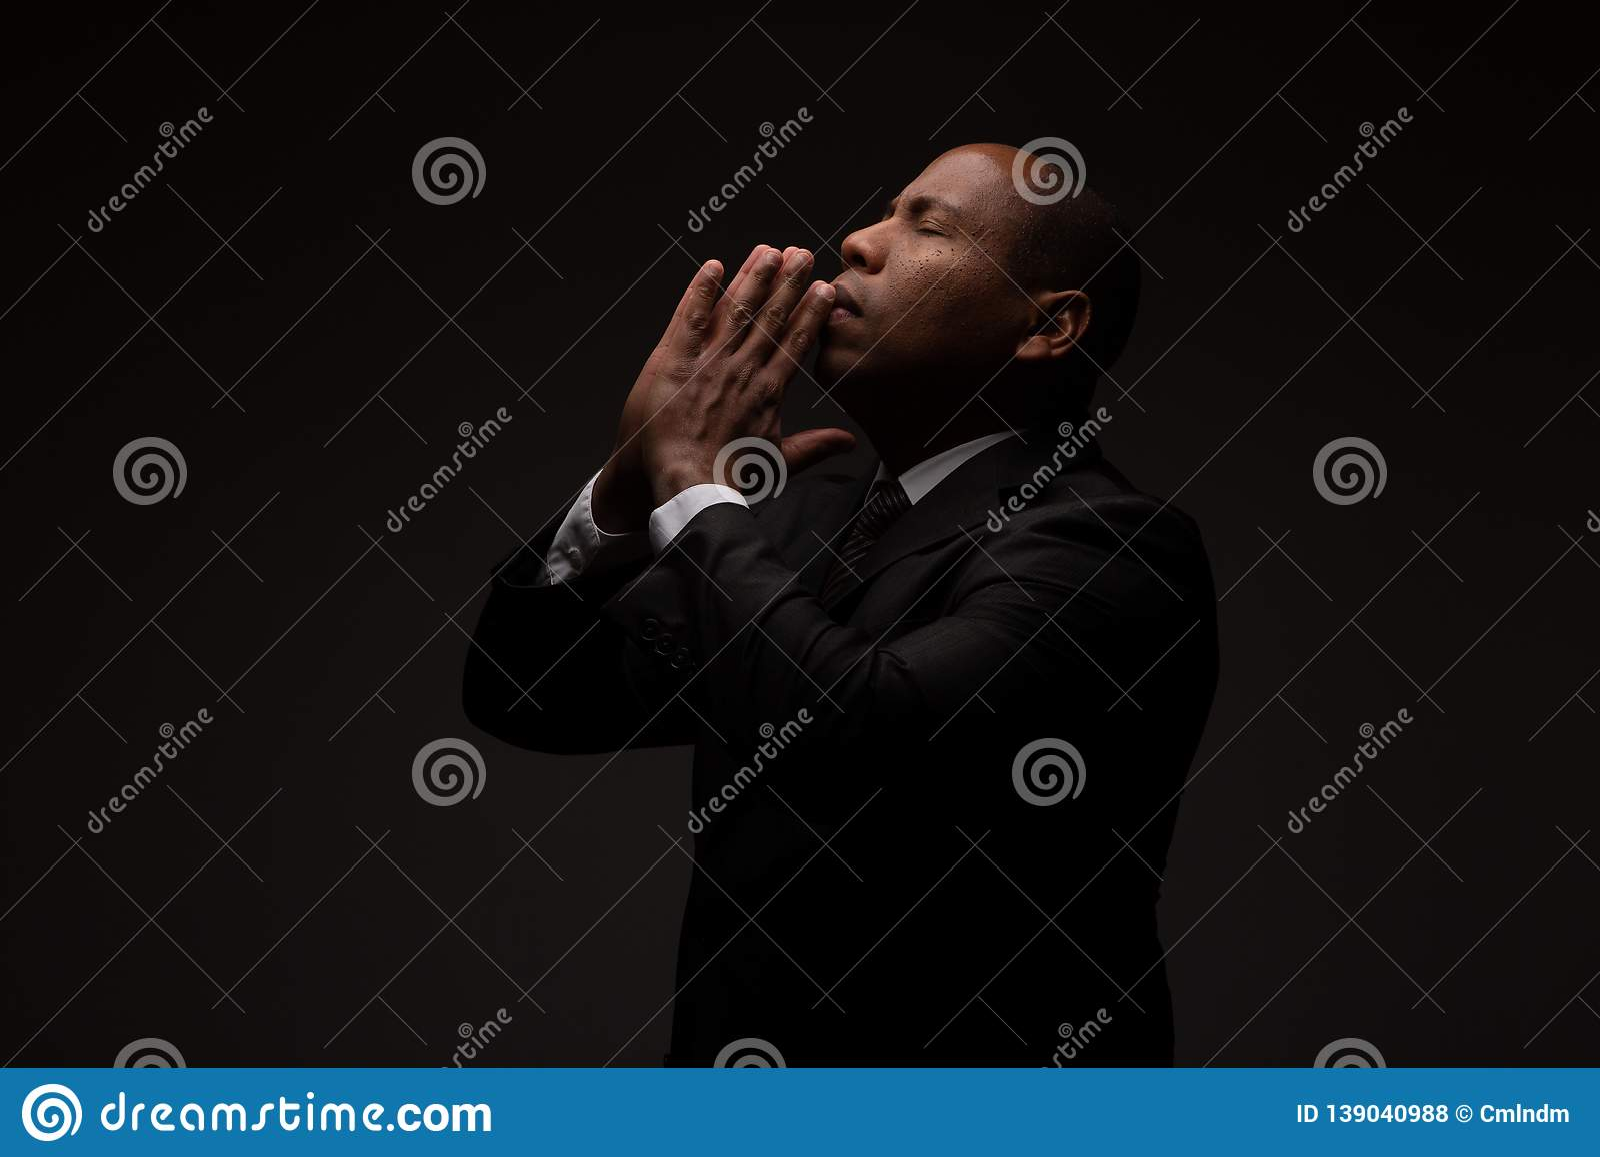 African American Christian Man Praying and Seeking Guidance from God